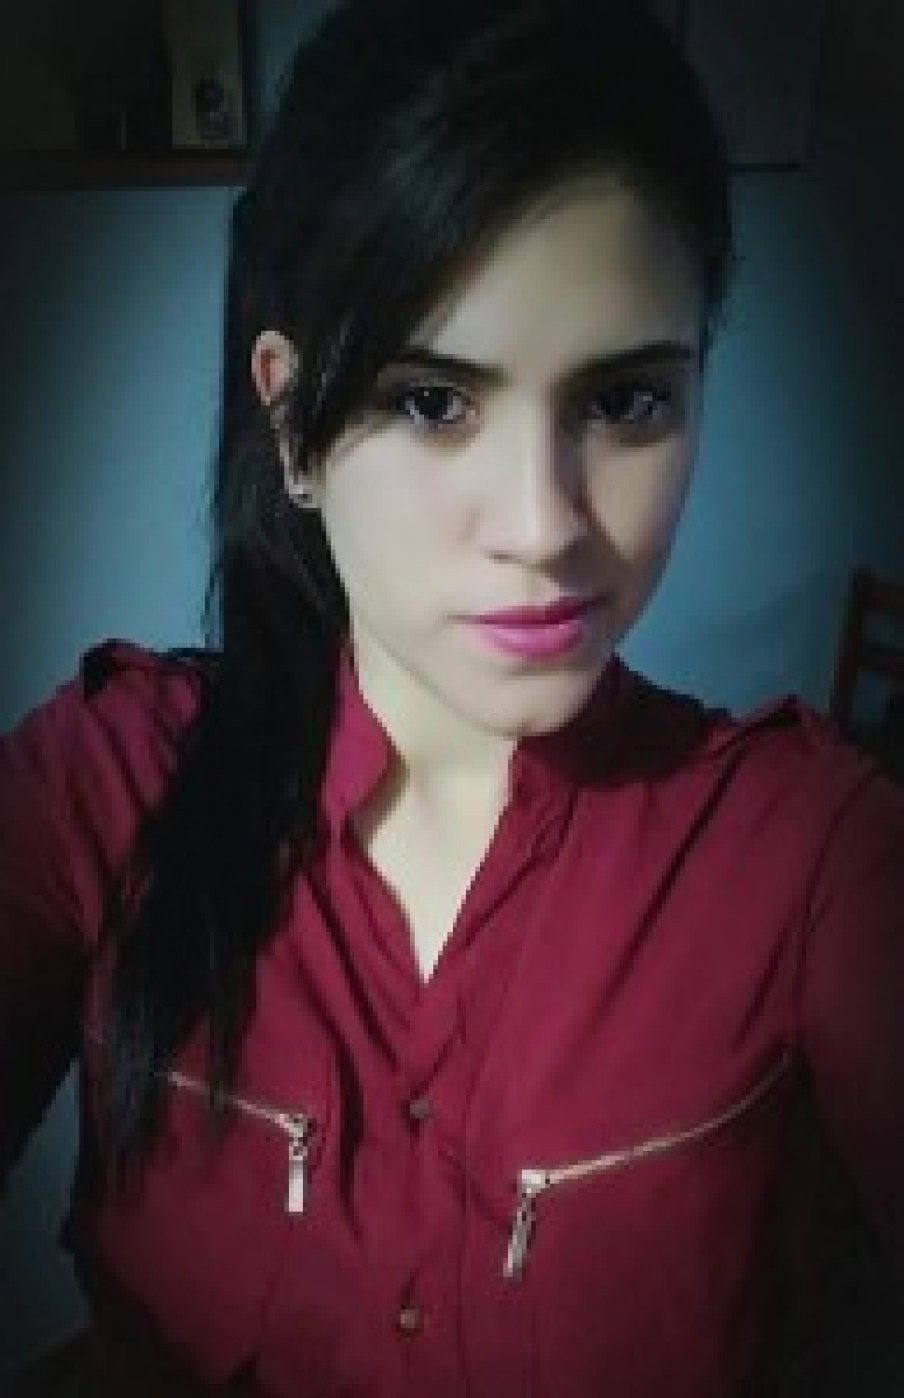 Lourdes Espíndola